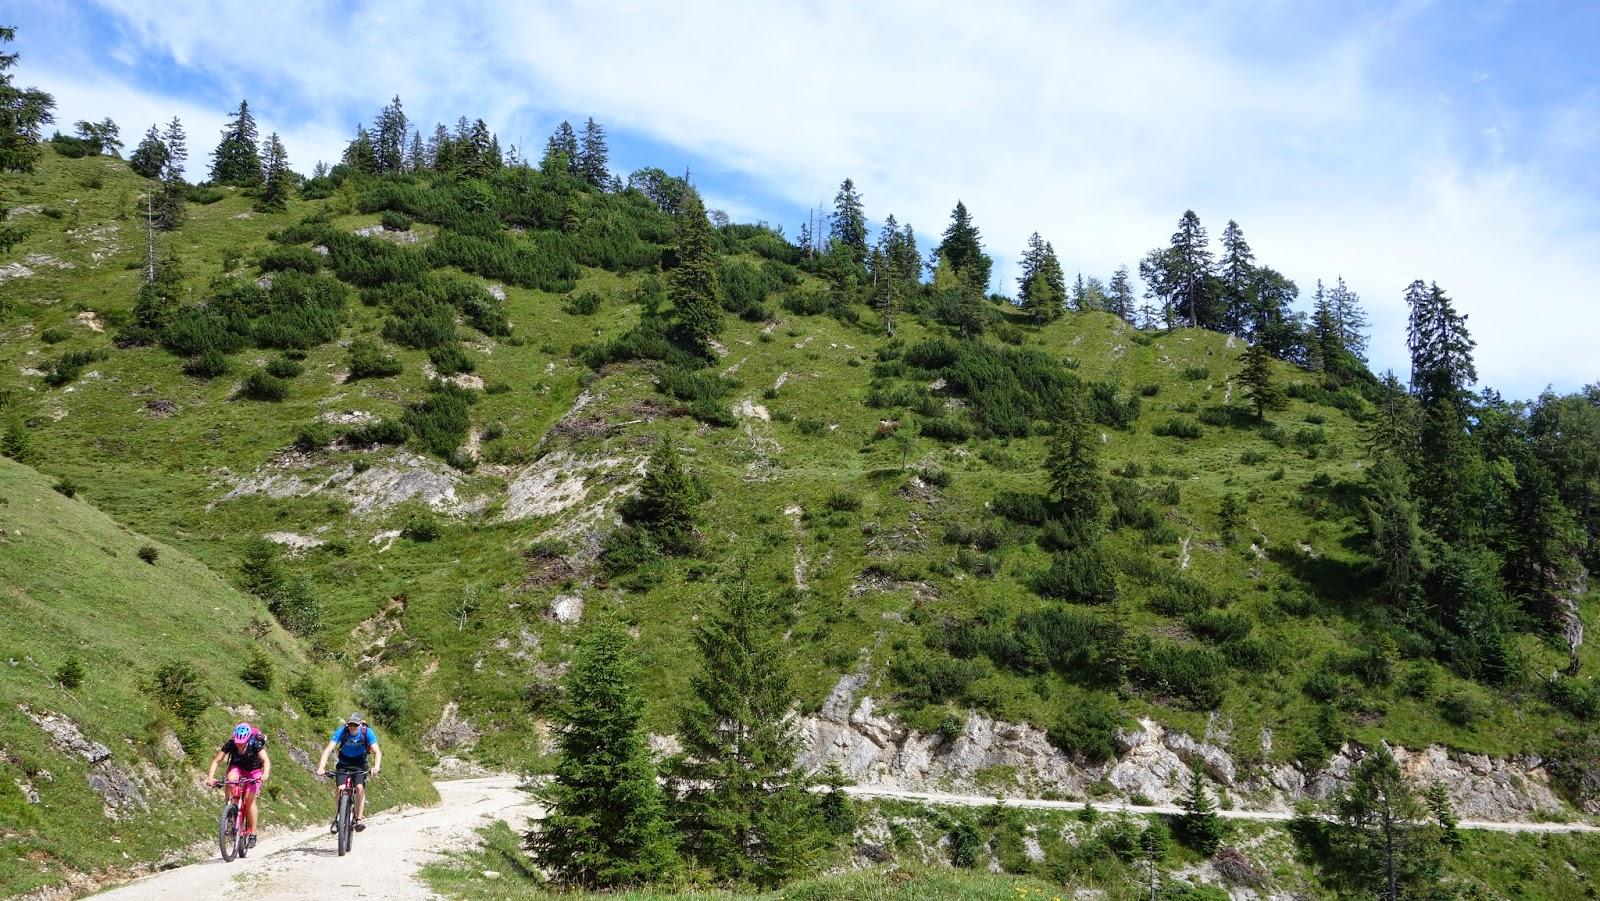 Thiersee Mountainbiken Mountainbike Tour: Veitsberg (Landl, Ursprungpass, Thiersee)